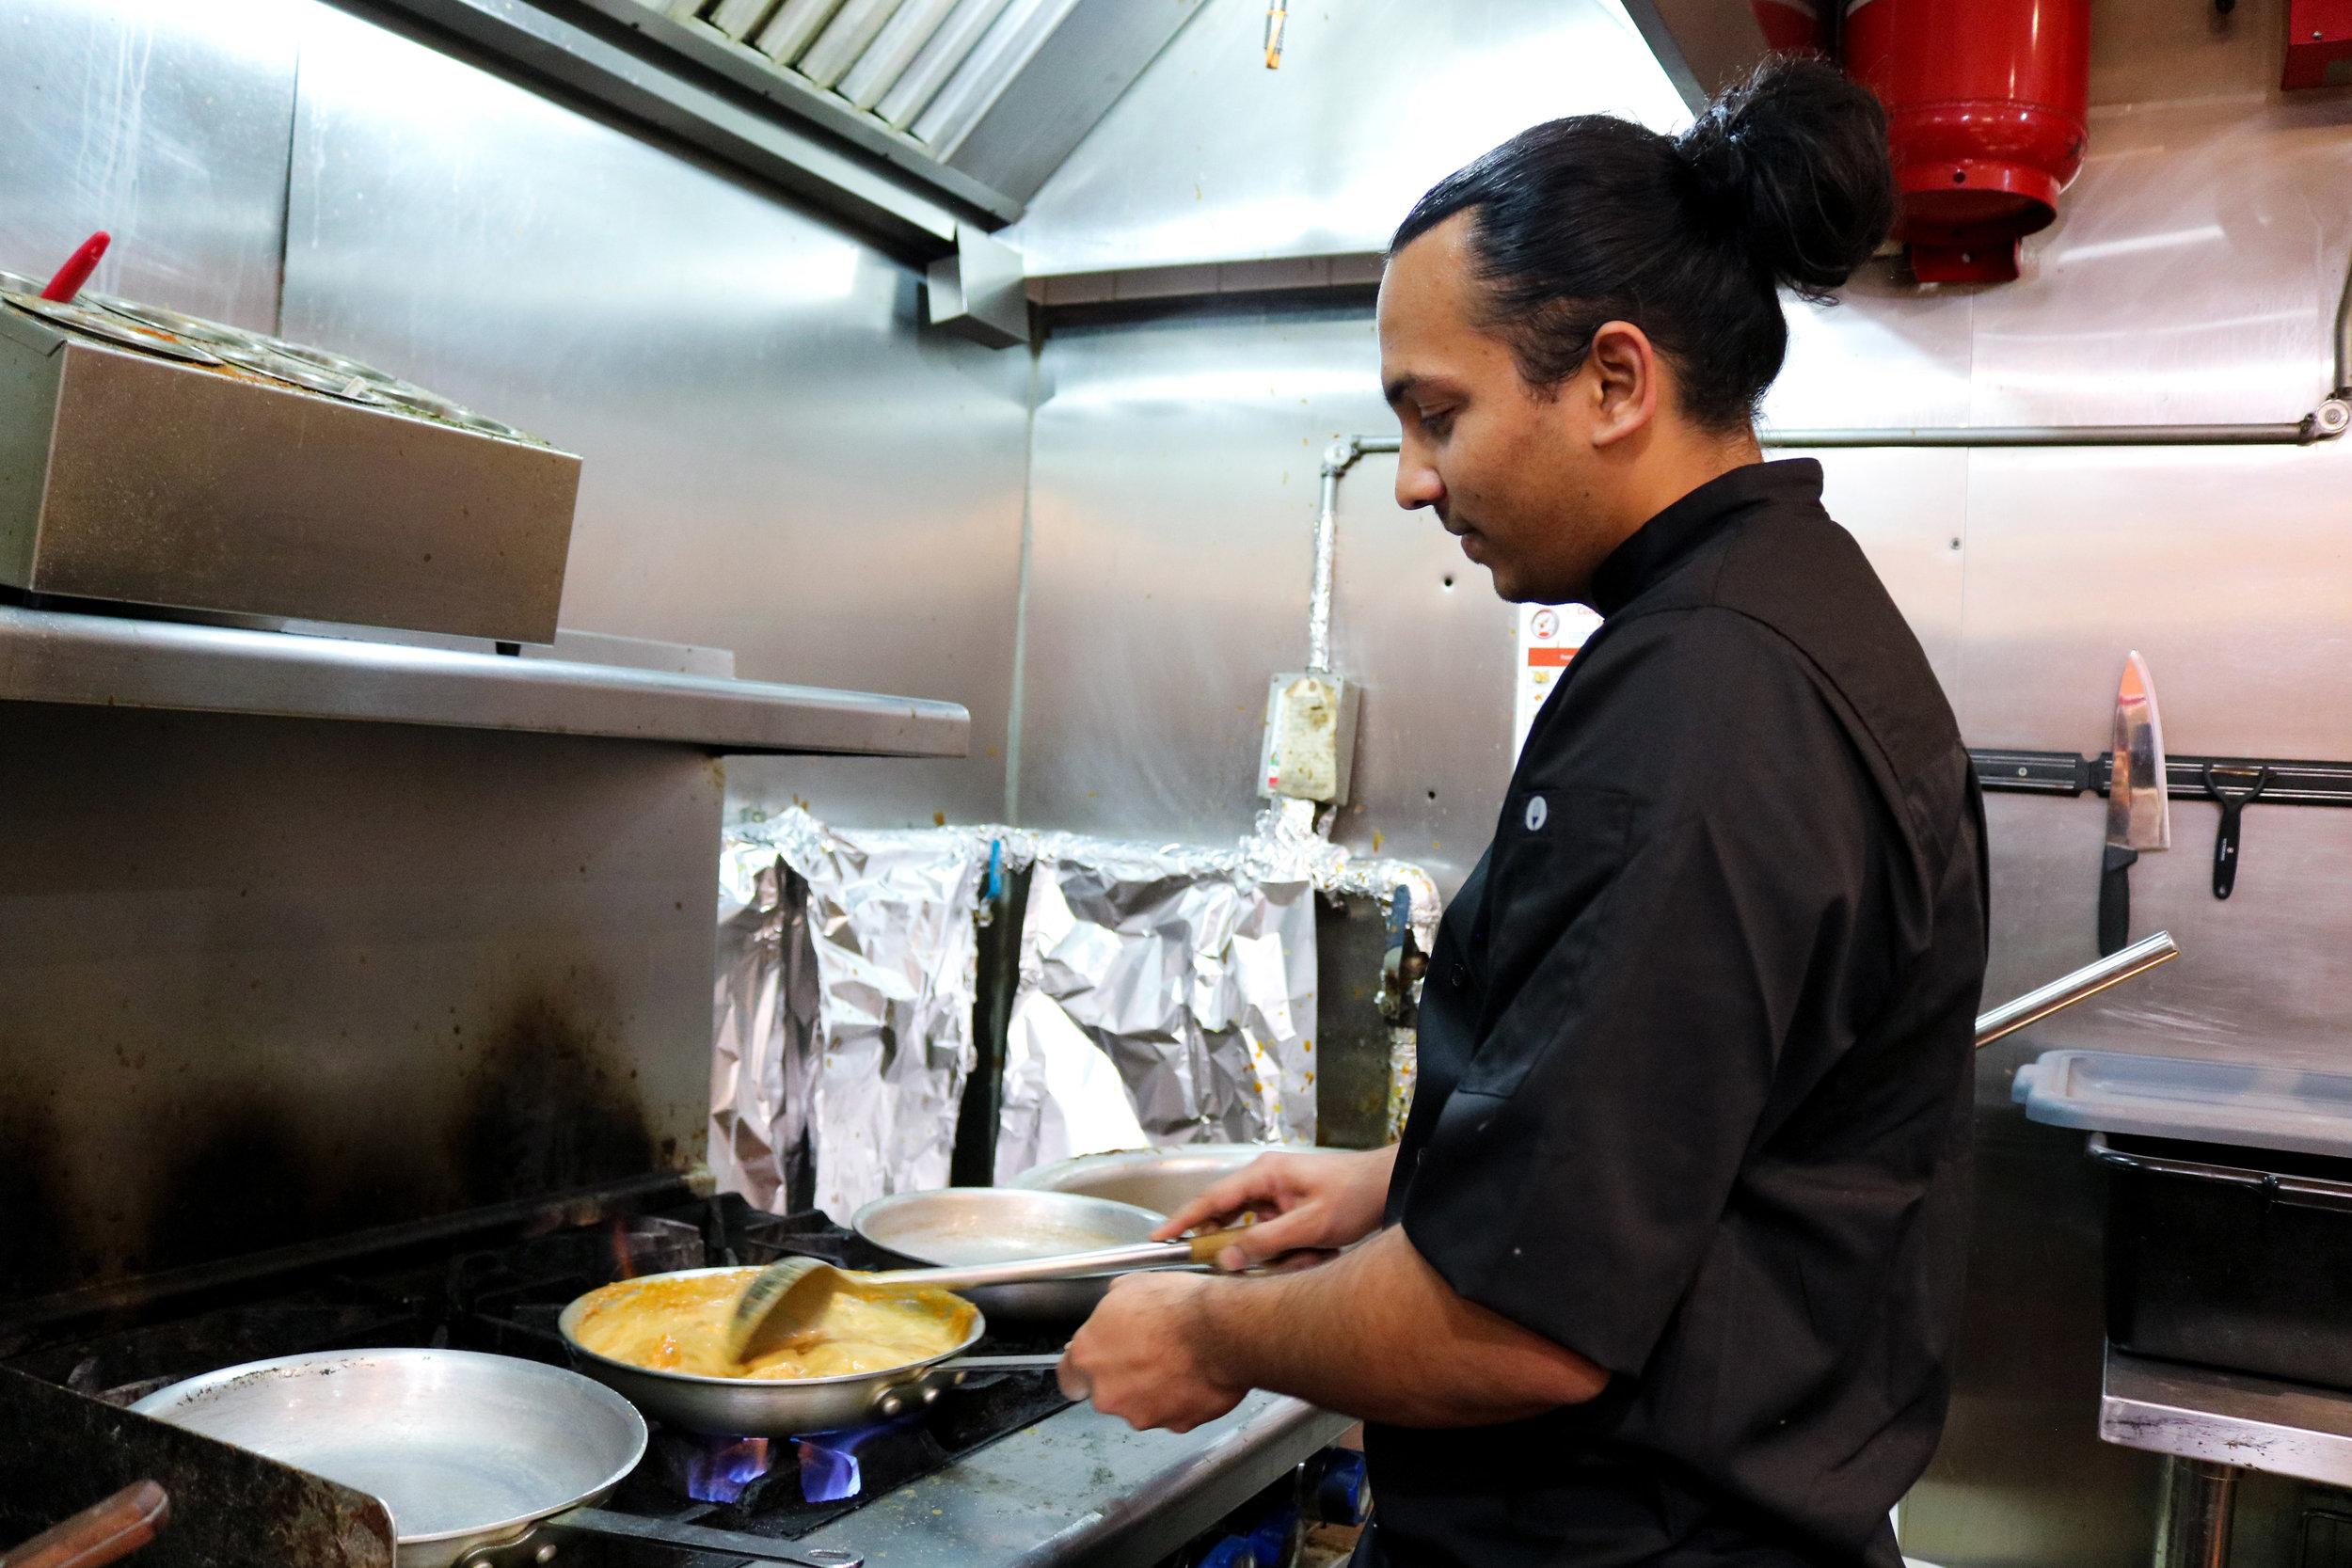 Bombay Roti Owner Gopi cooking butter chicken.jpg